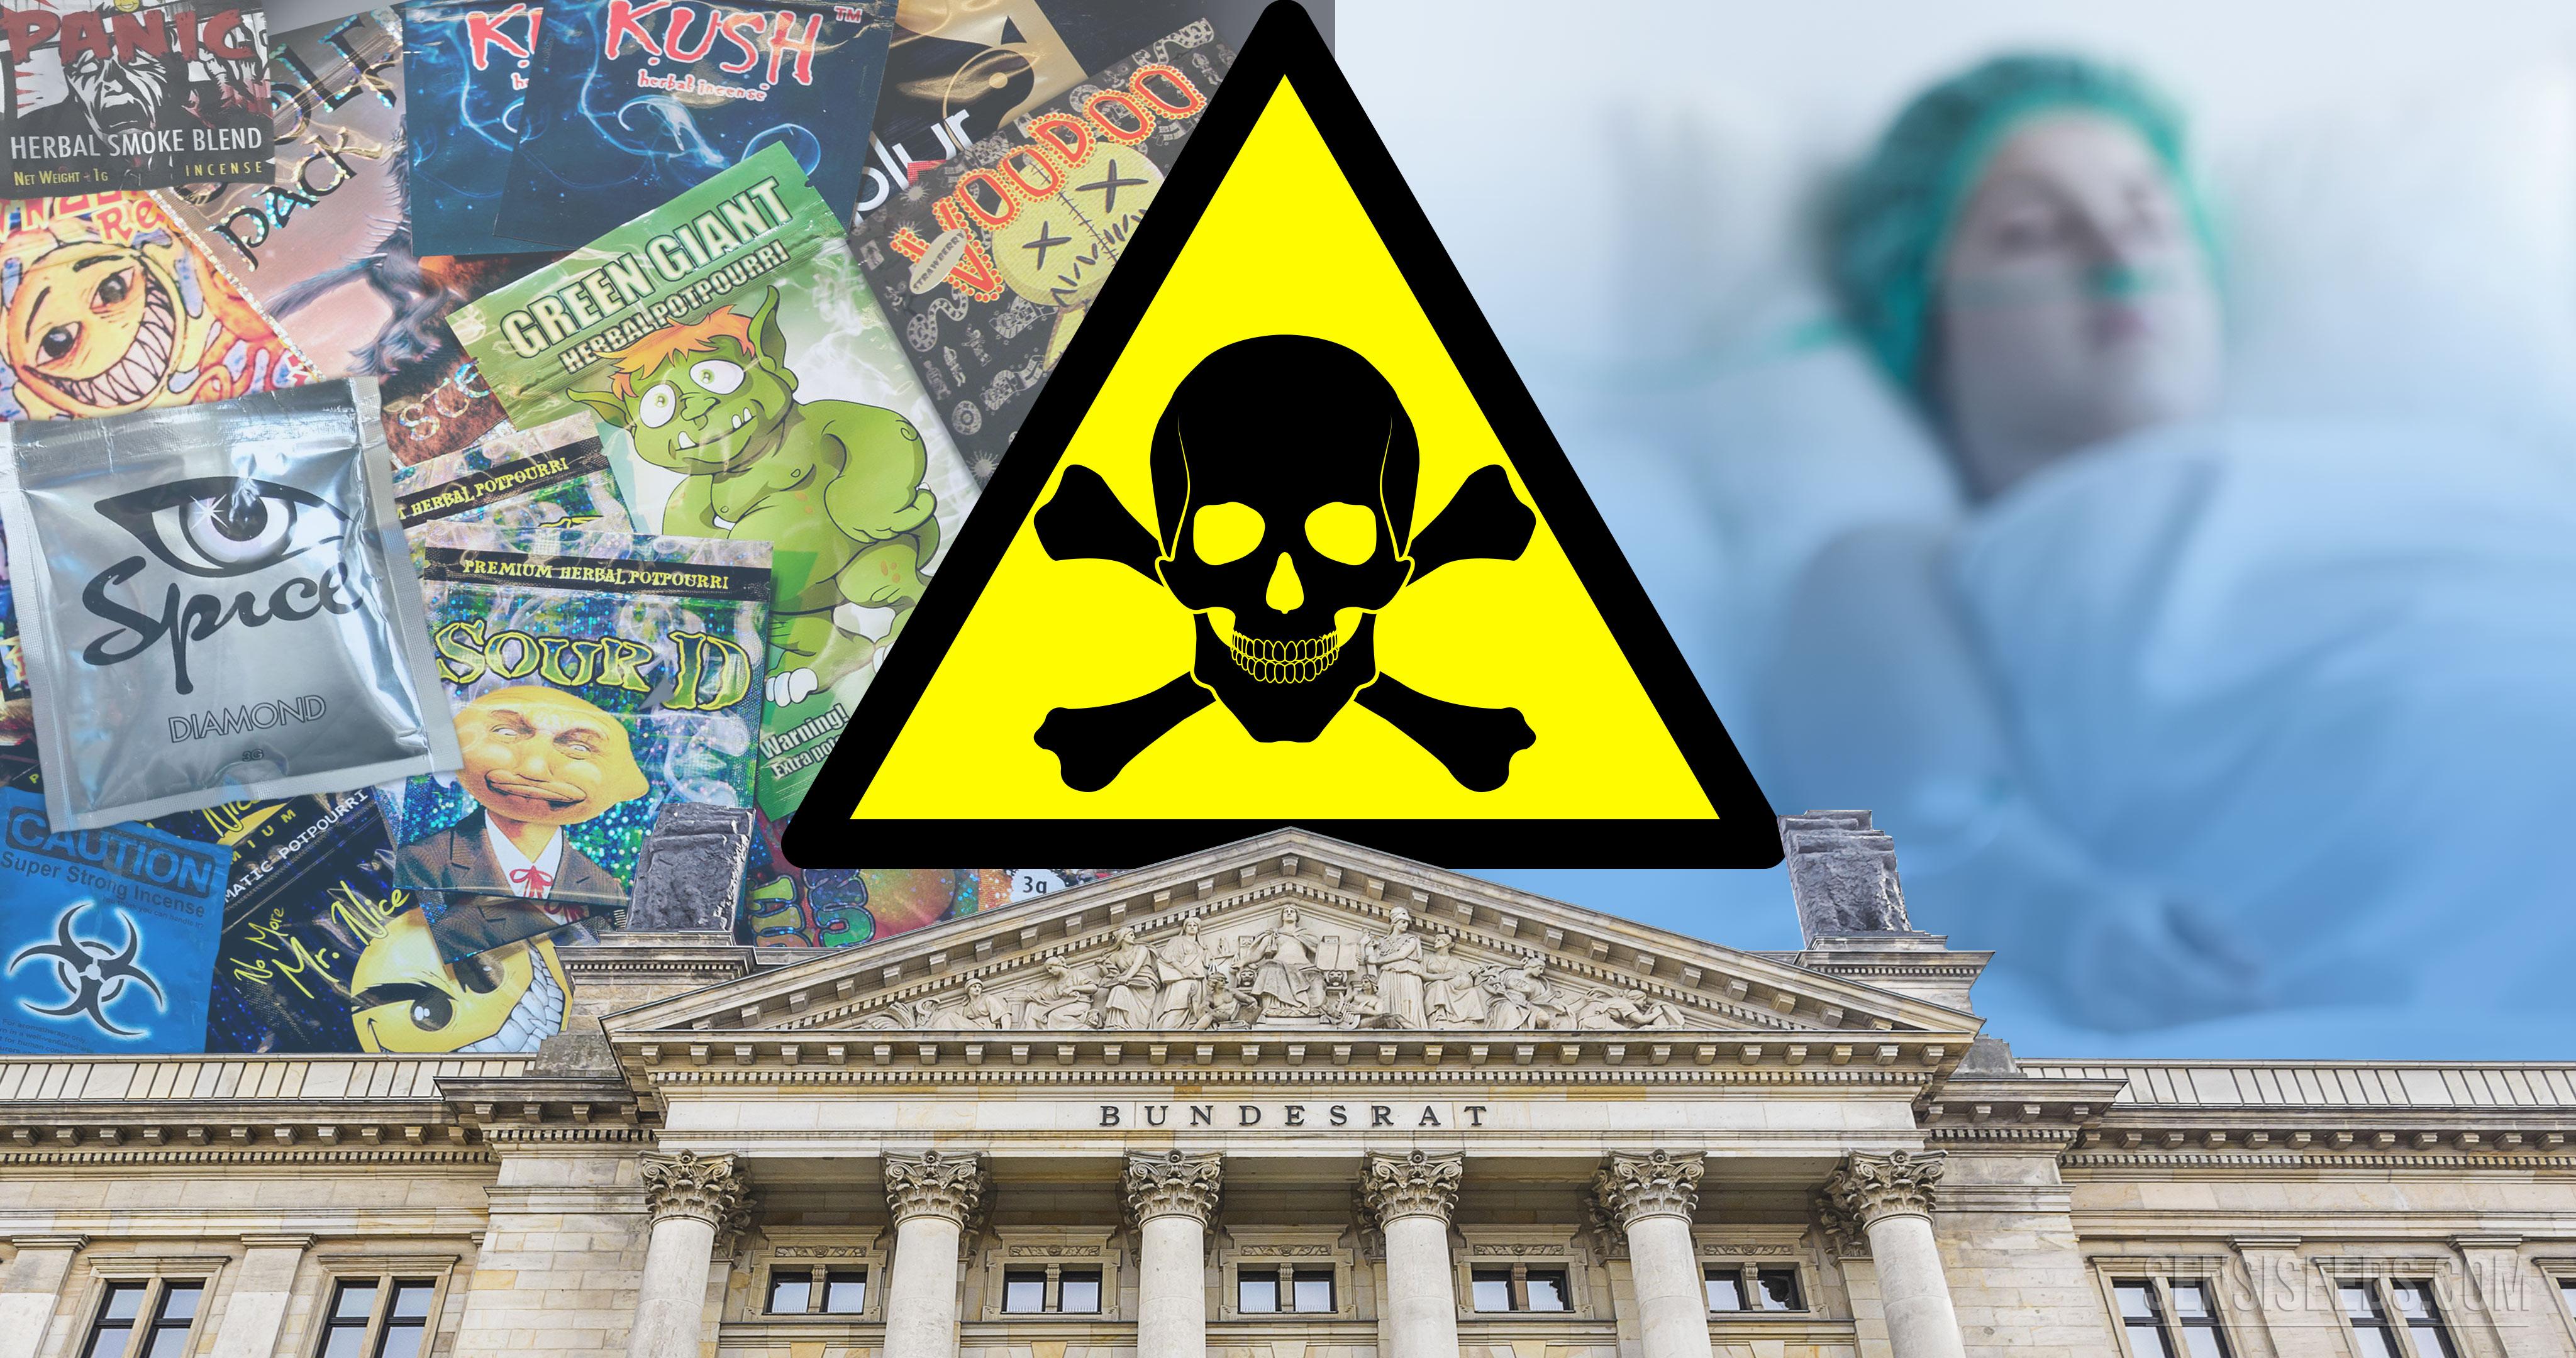 Buy herbal highs - Cannabis And Legal Highs In The German Bundesrat